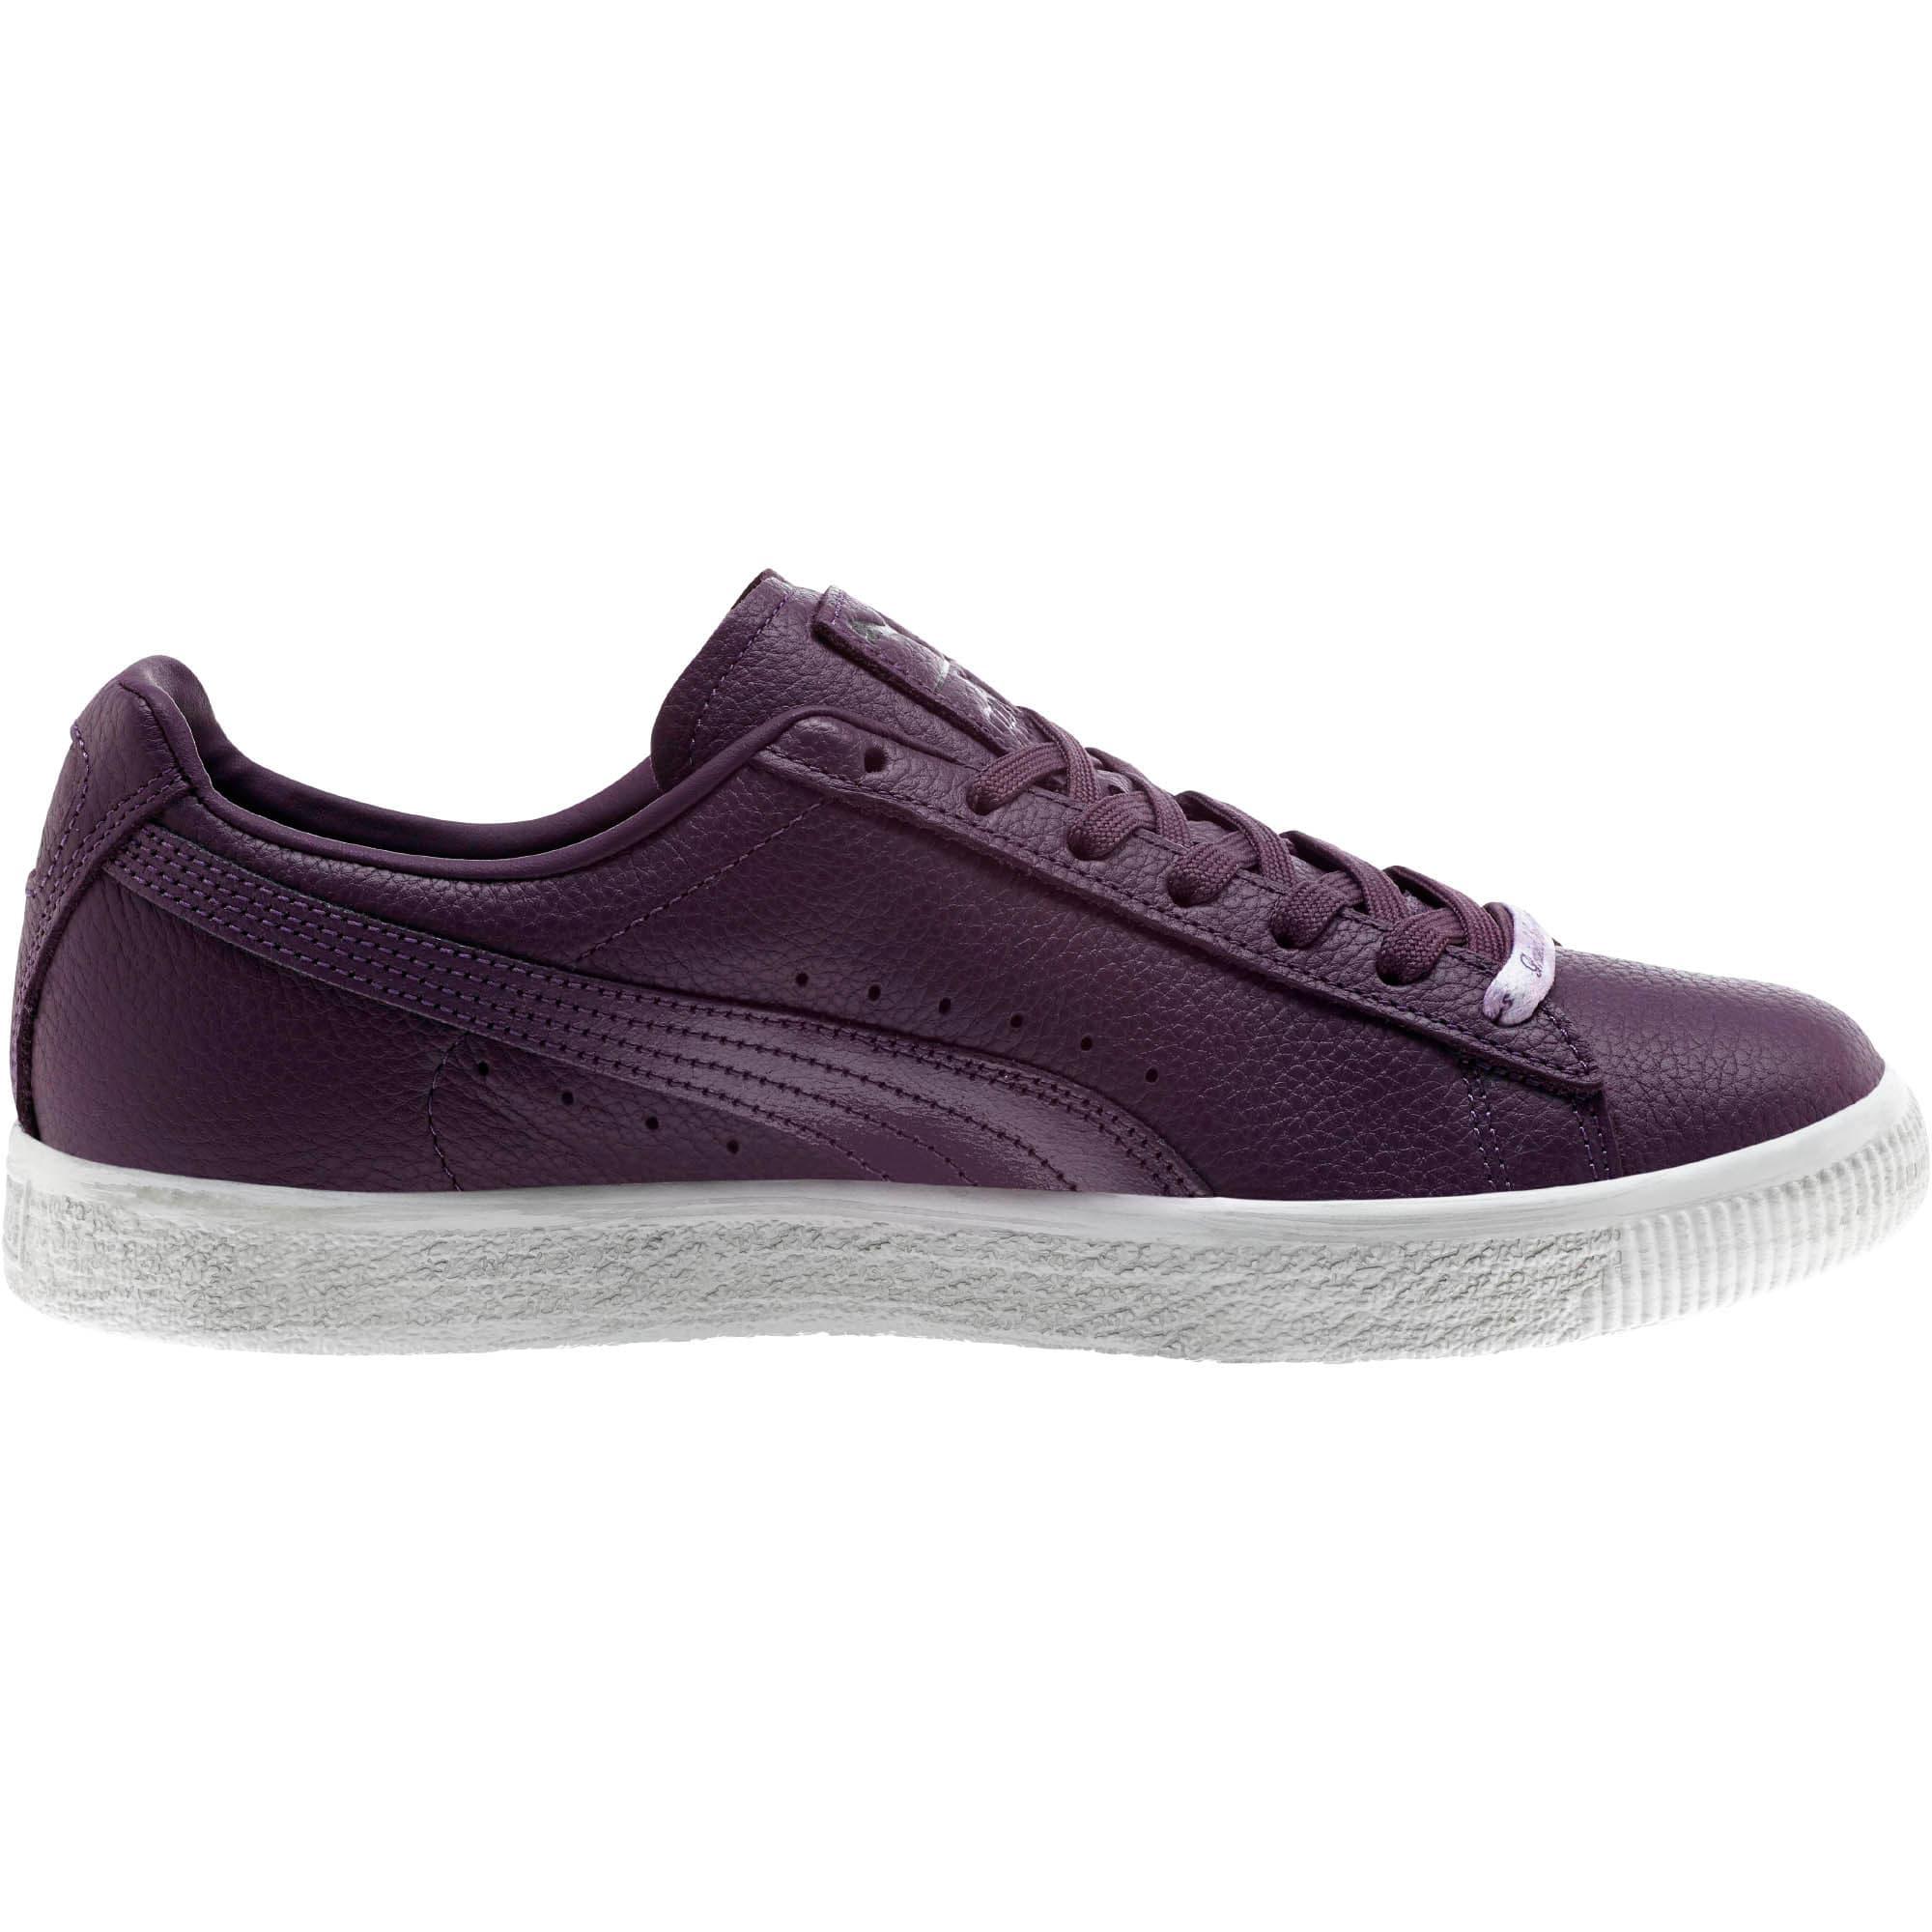 Thumbnail 4 of Clyde x PRPS Sneakers, Indigo-Puma Black, medium